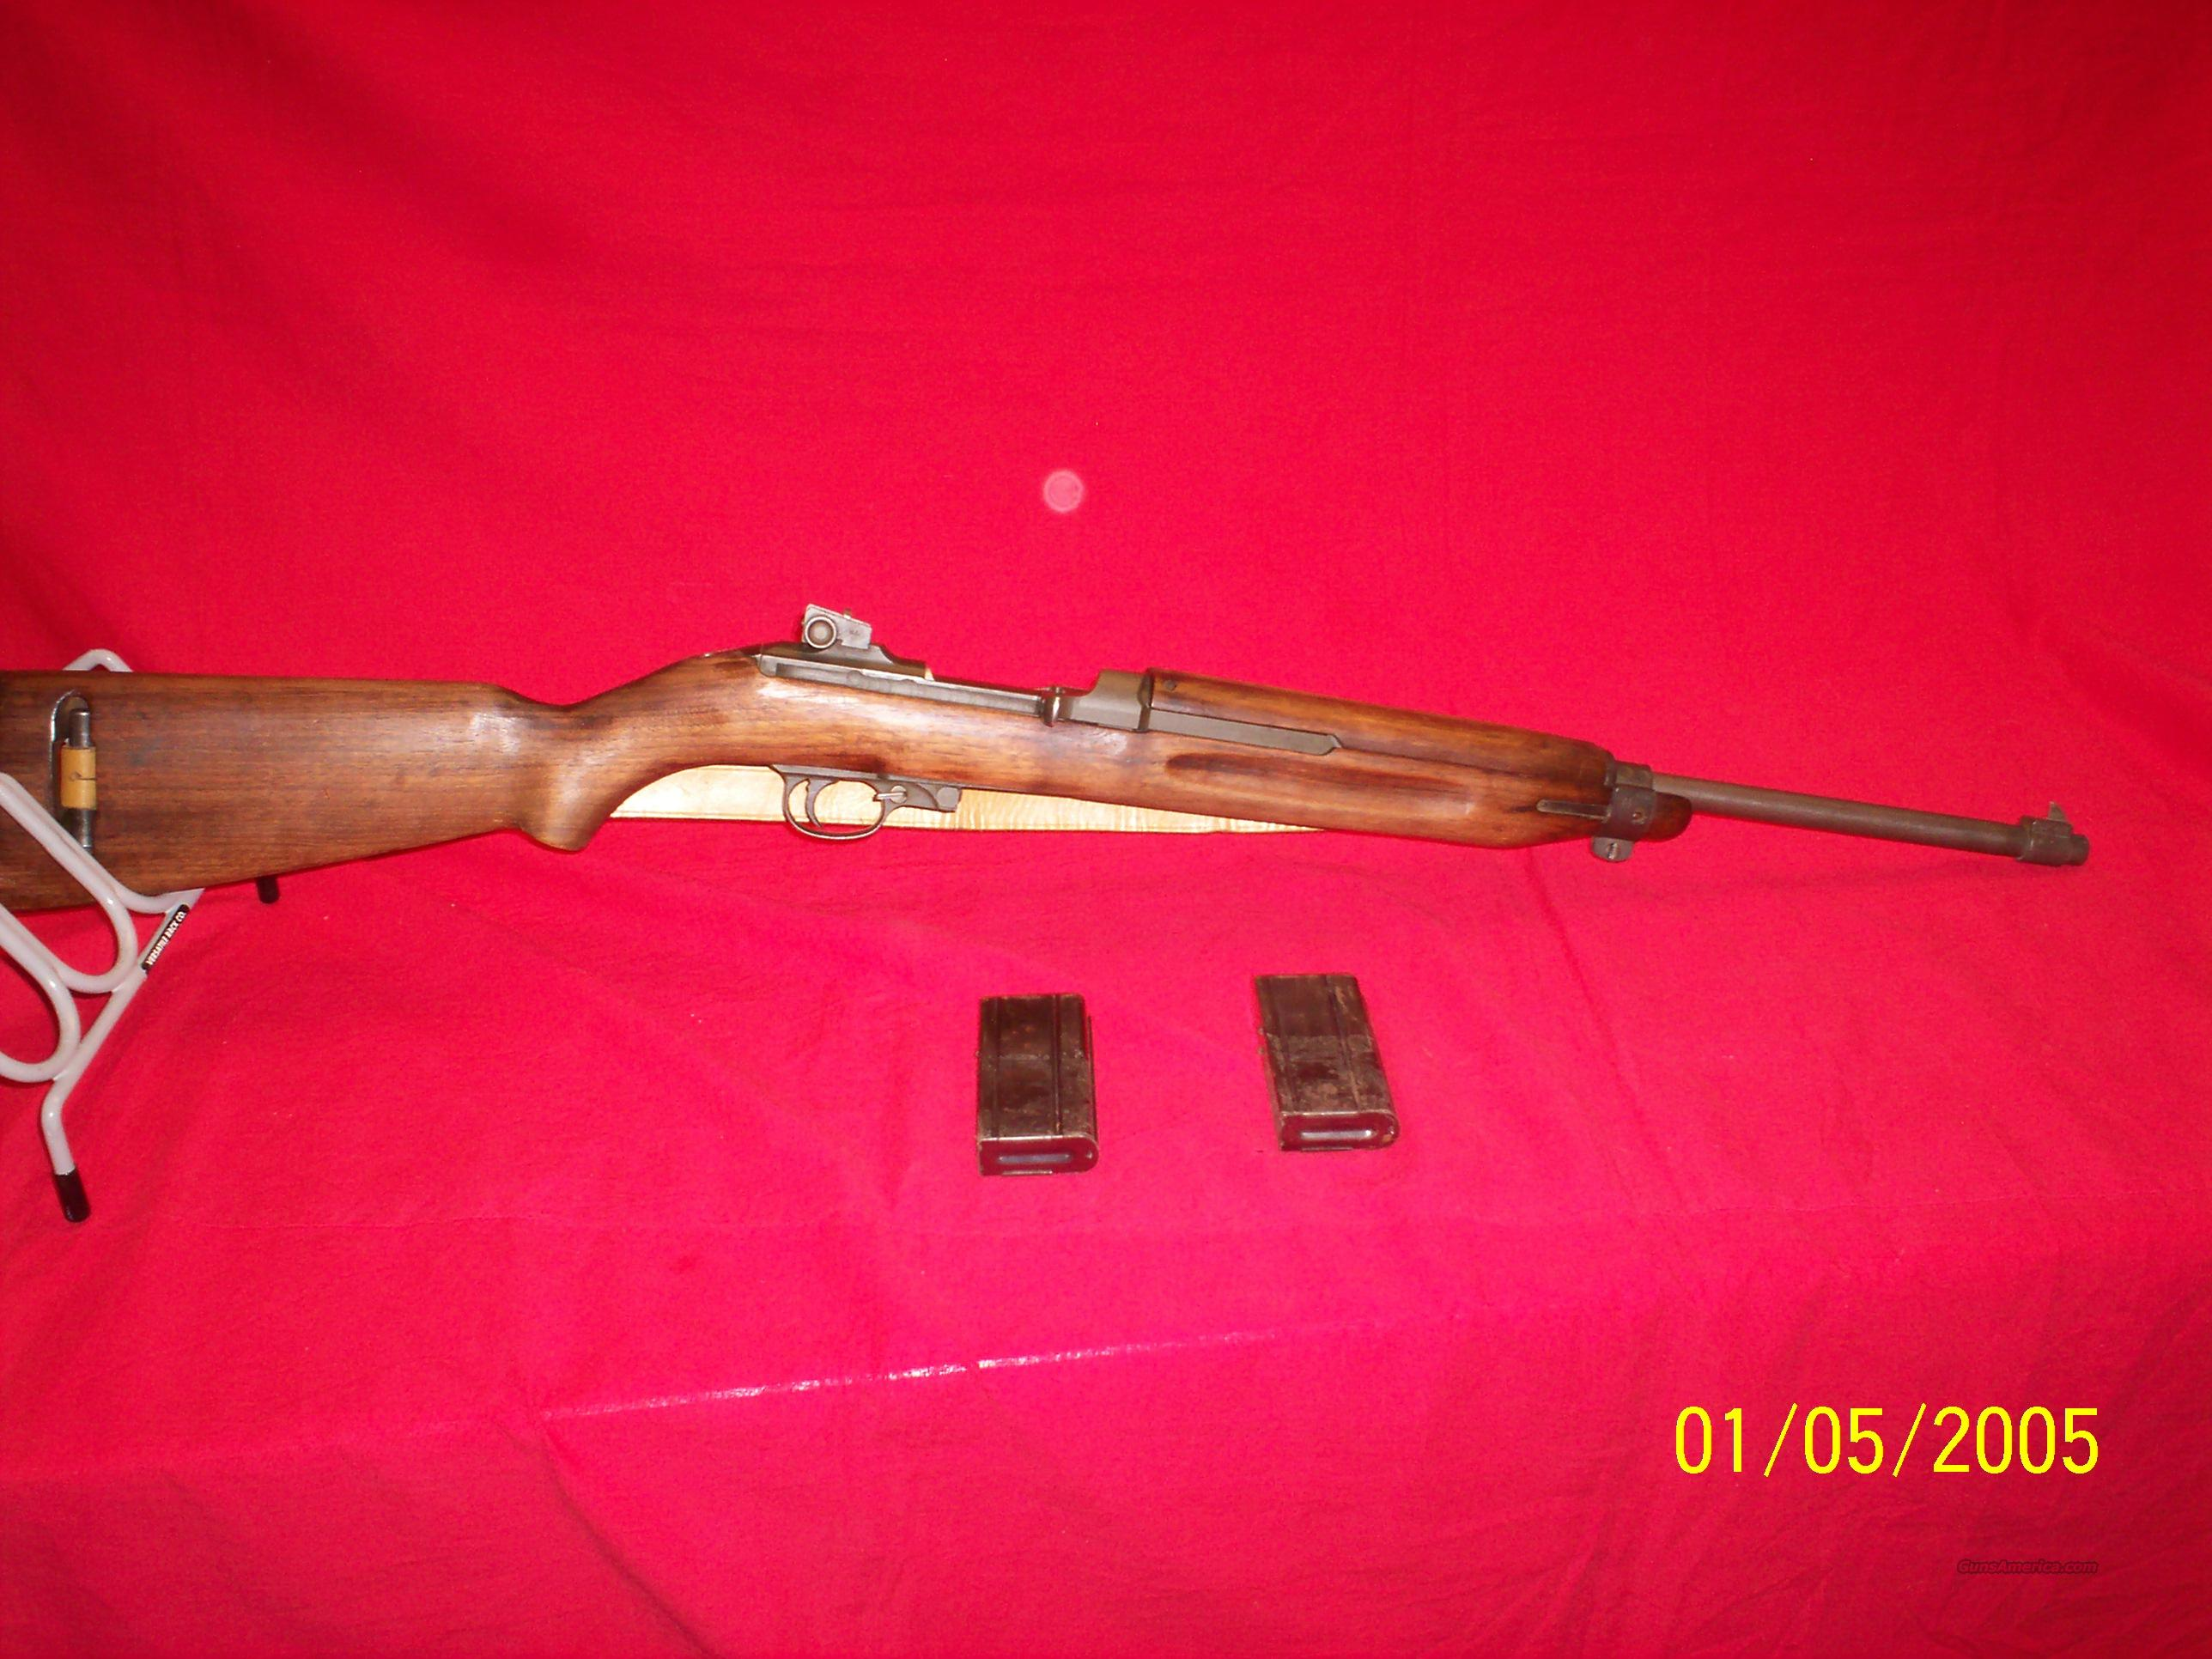 STANDARD PRODUCTS 30M1  Guns > Rifles > Military Misc. Rifles US > M1 Carbine